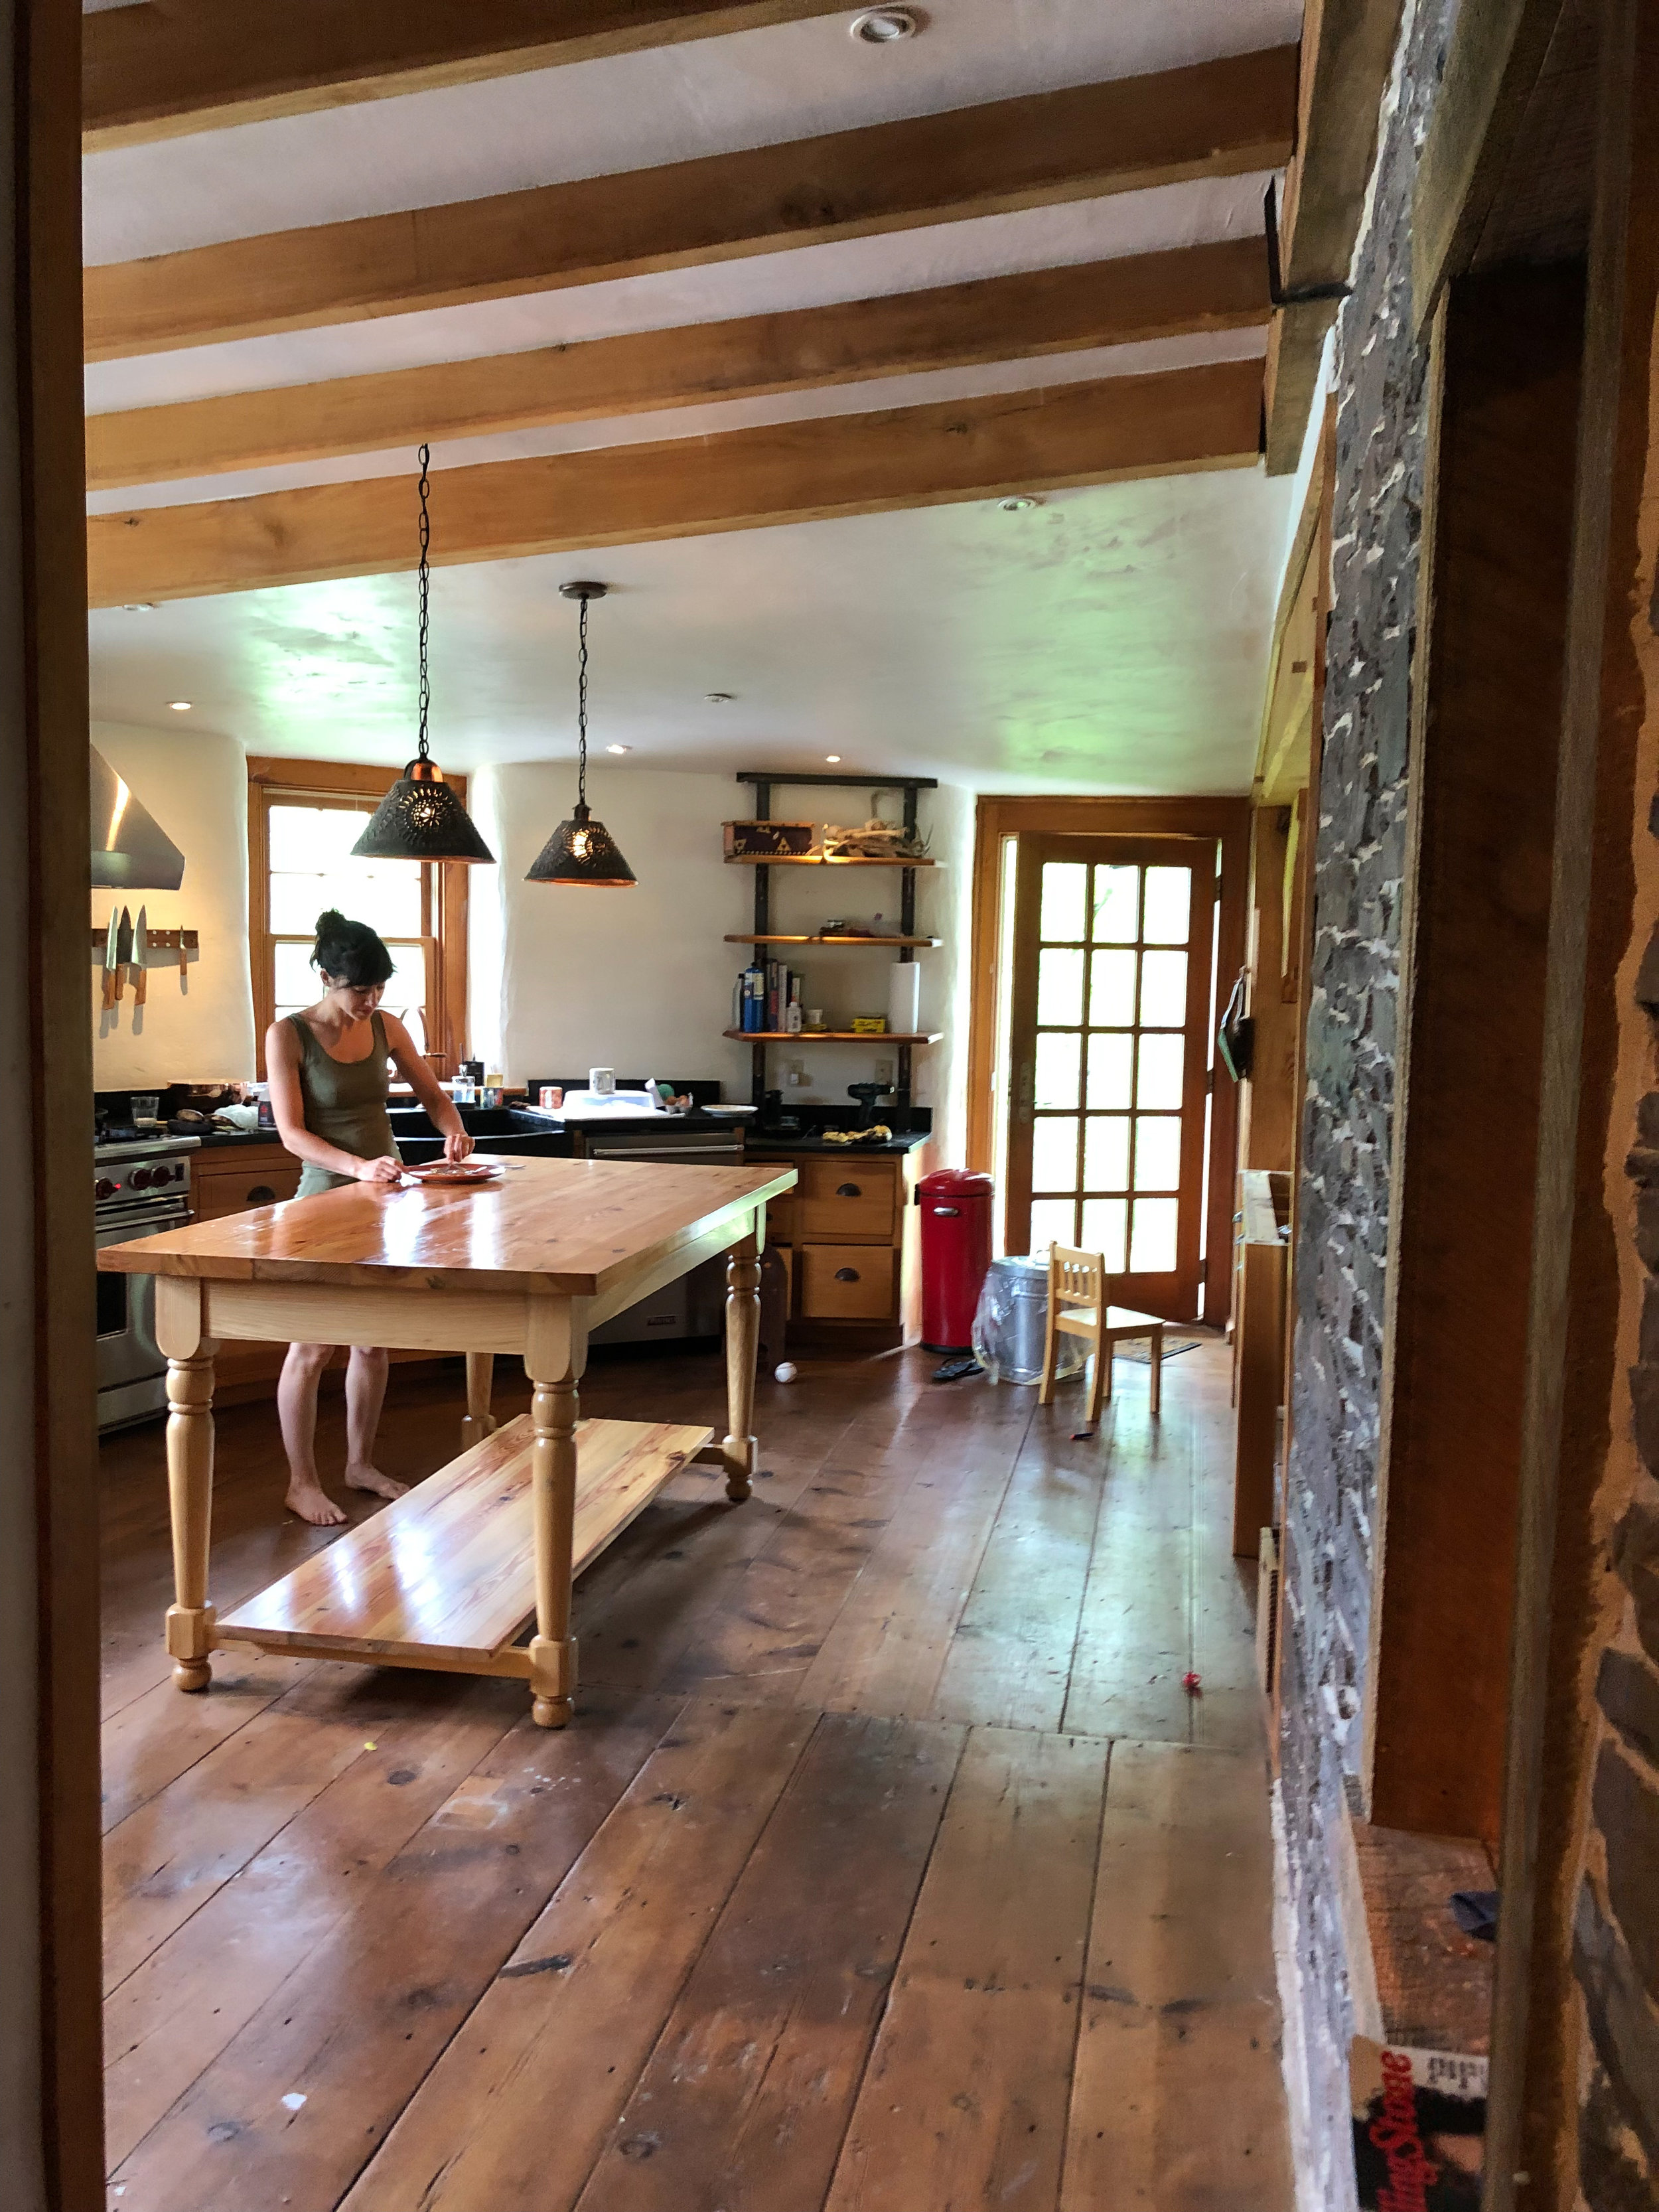 Heart pine and ash wood kitchen island